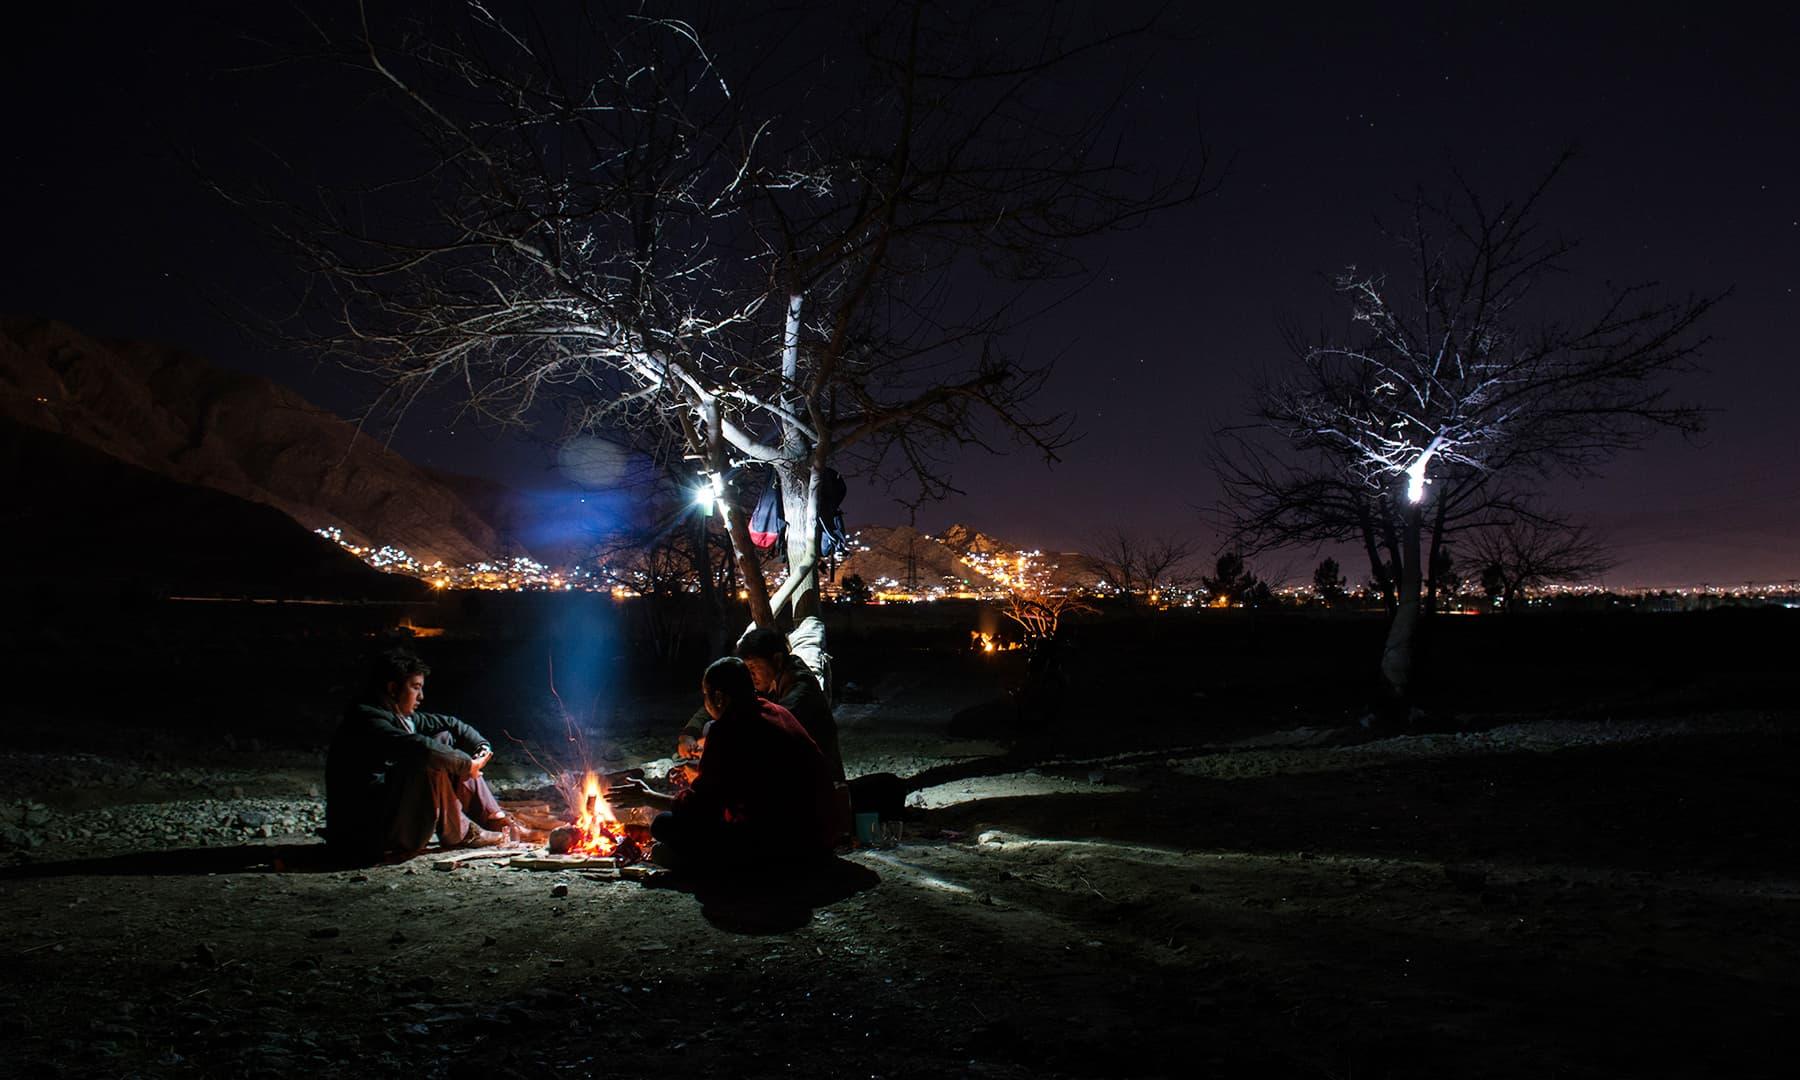 Beautiful-Paistan-Quetta-DailyPakistan-10